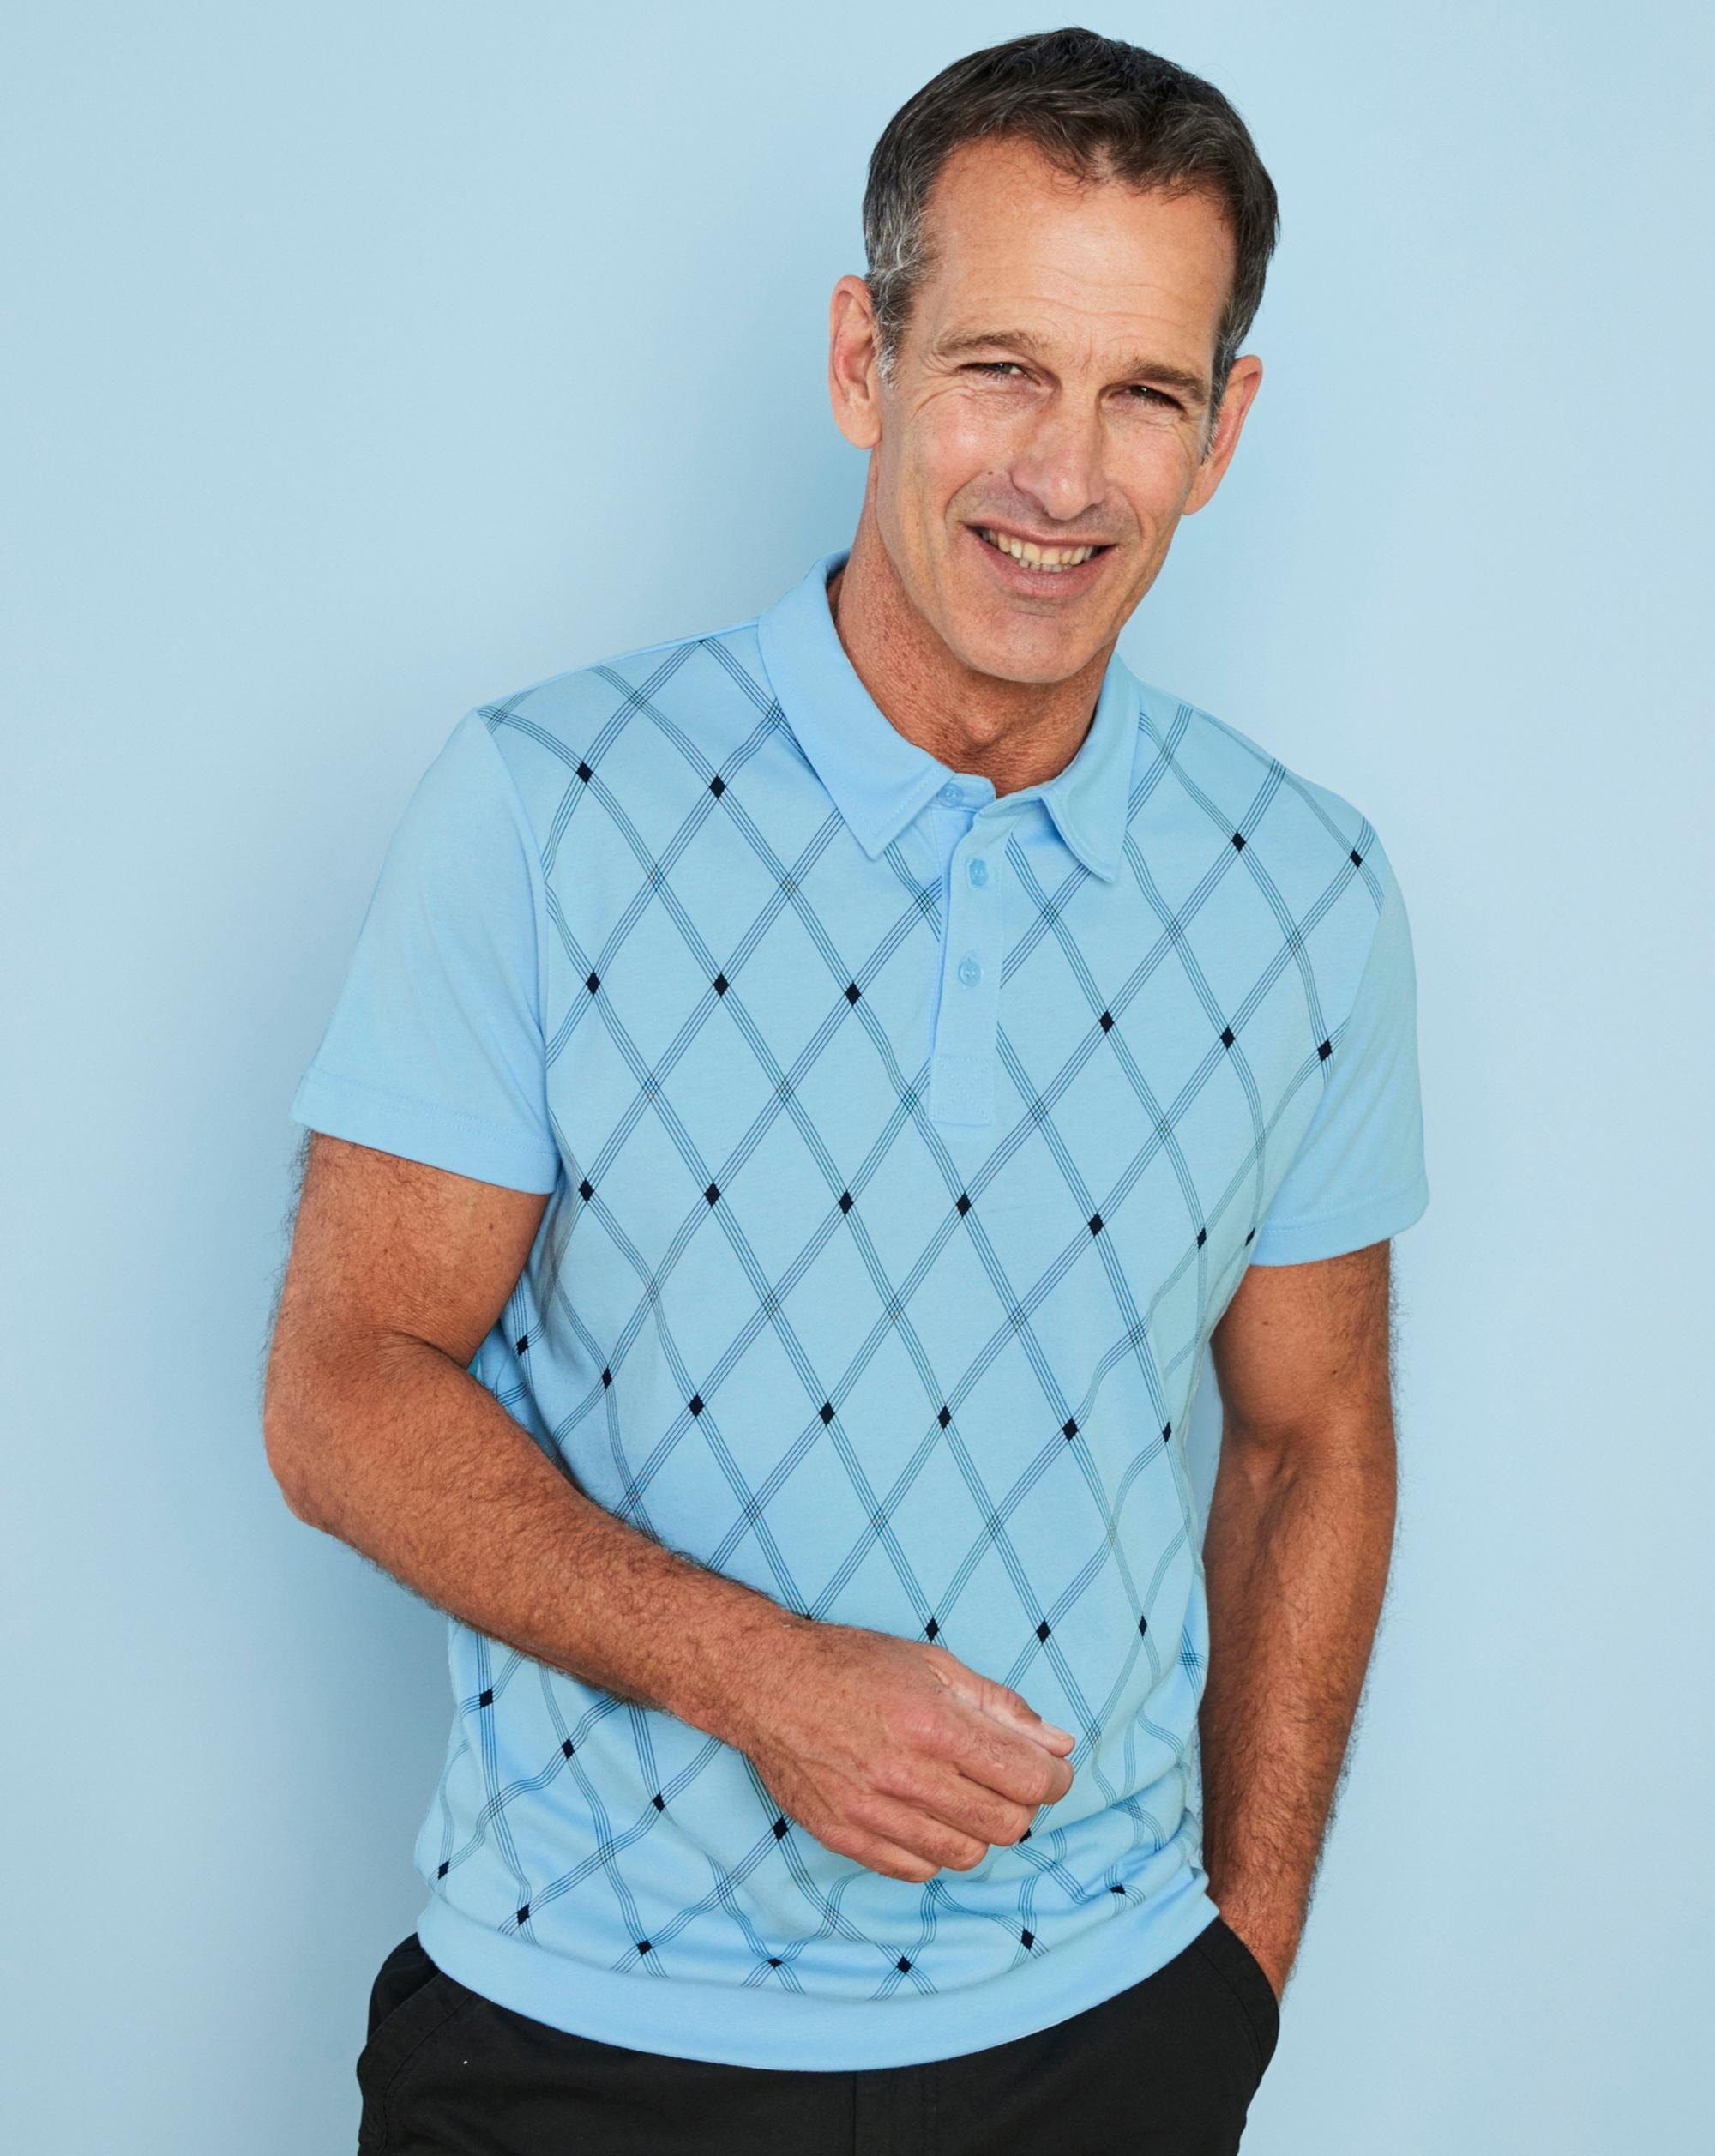 fd37bfb8bfc90b New men's vintage style shirts and retro shirts such as dress shirts, sport  shirts, western shirts, Hawaiian shirts, polos and T shirts.